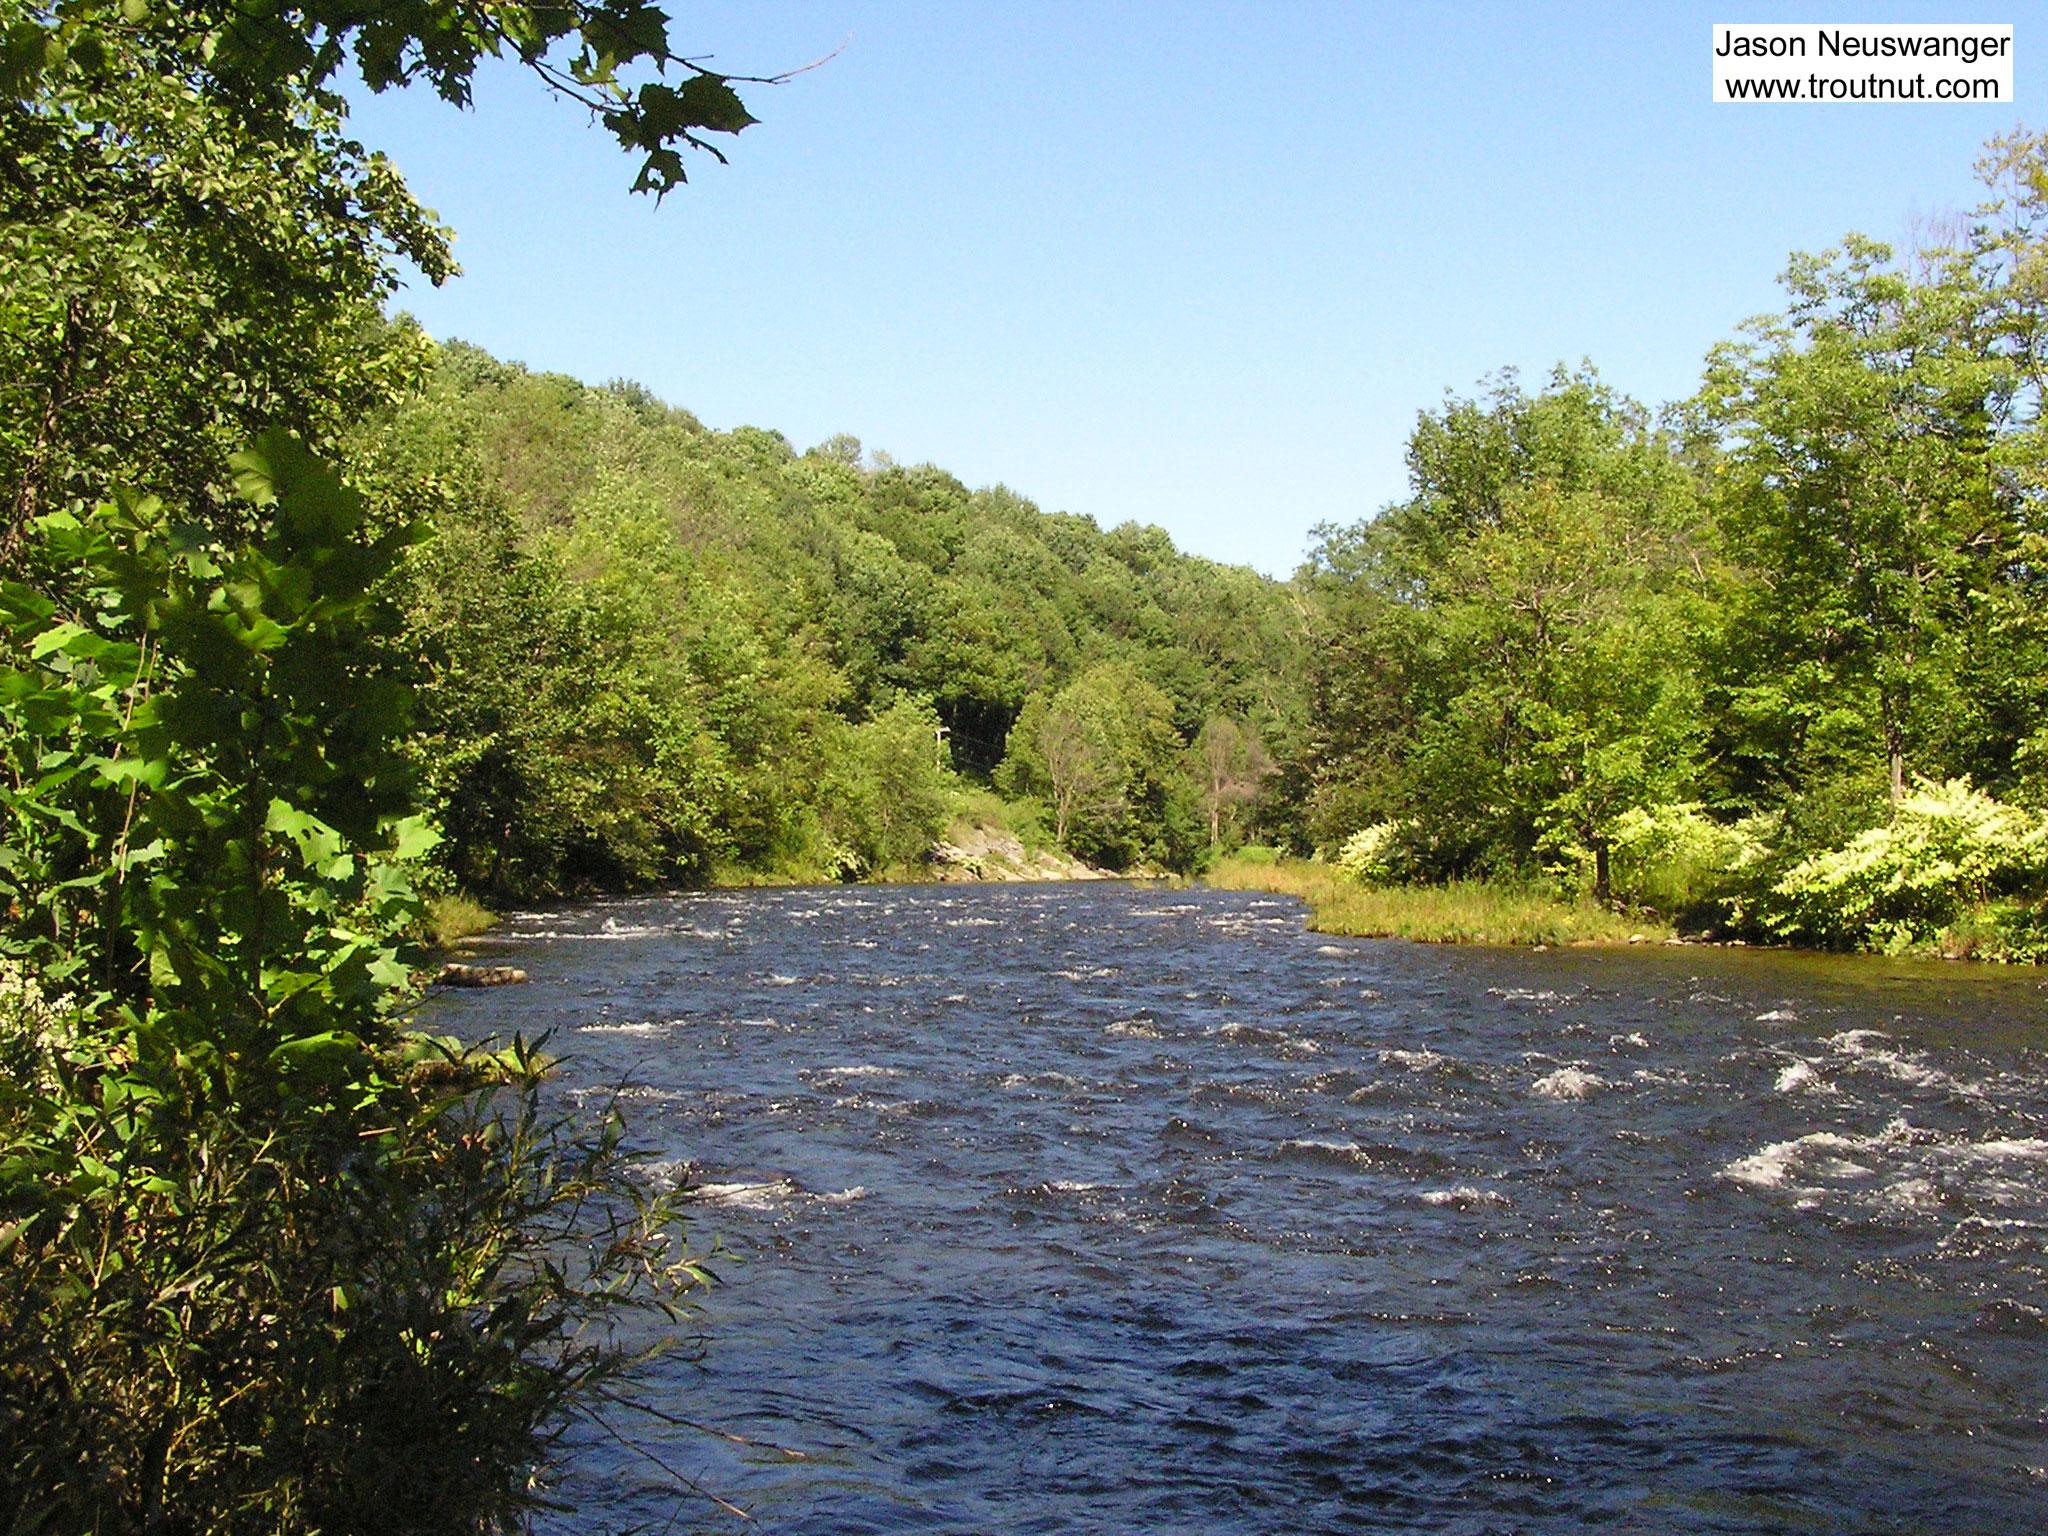 From Willowemoc Creek in New York.